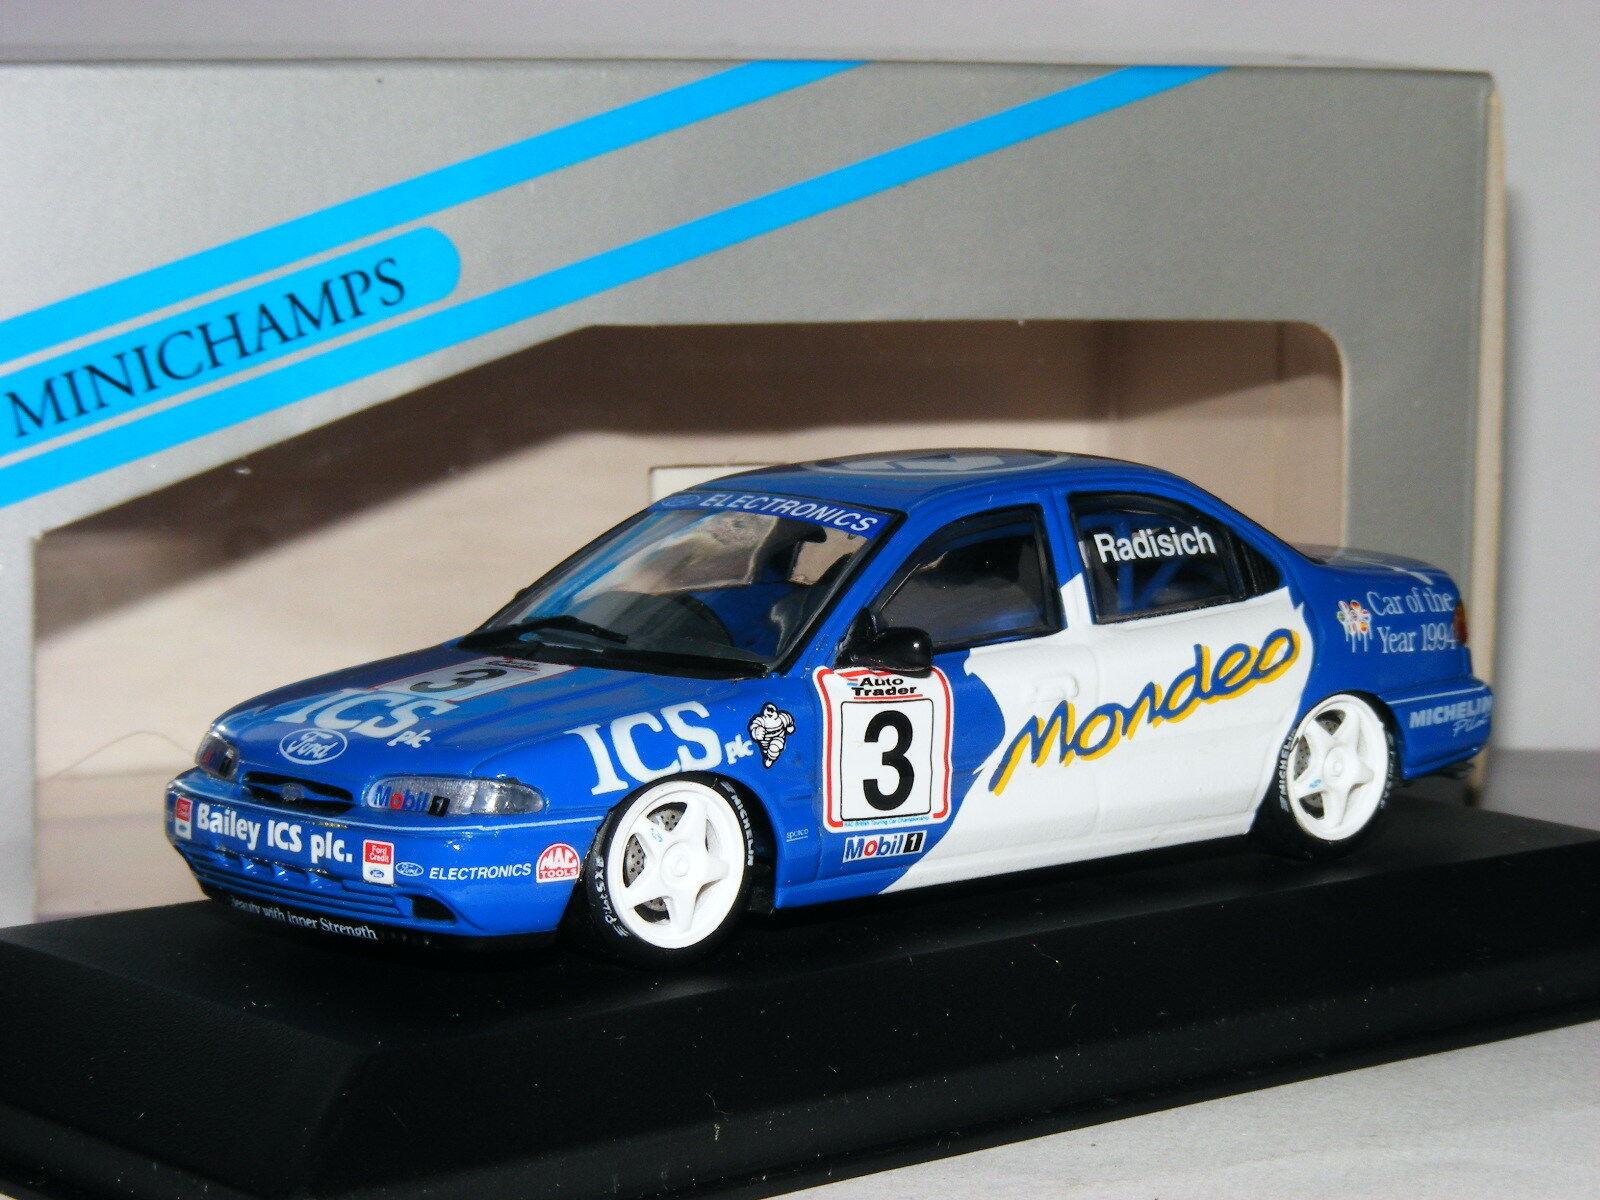 MINICHAMPS FORD MONDEO Paul RADISICH 1994 BTCC  3 1 1 1 43 7c6b32